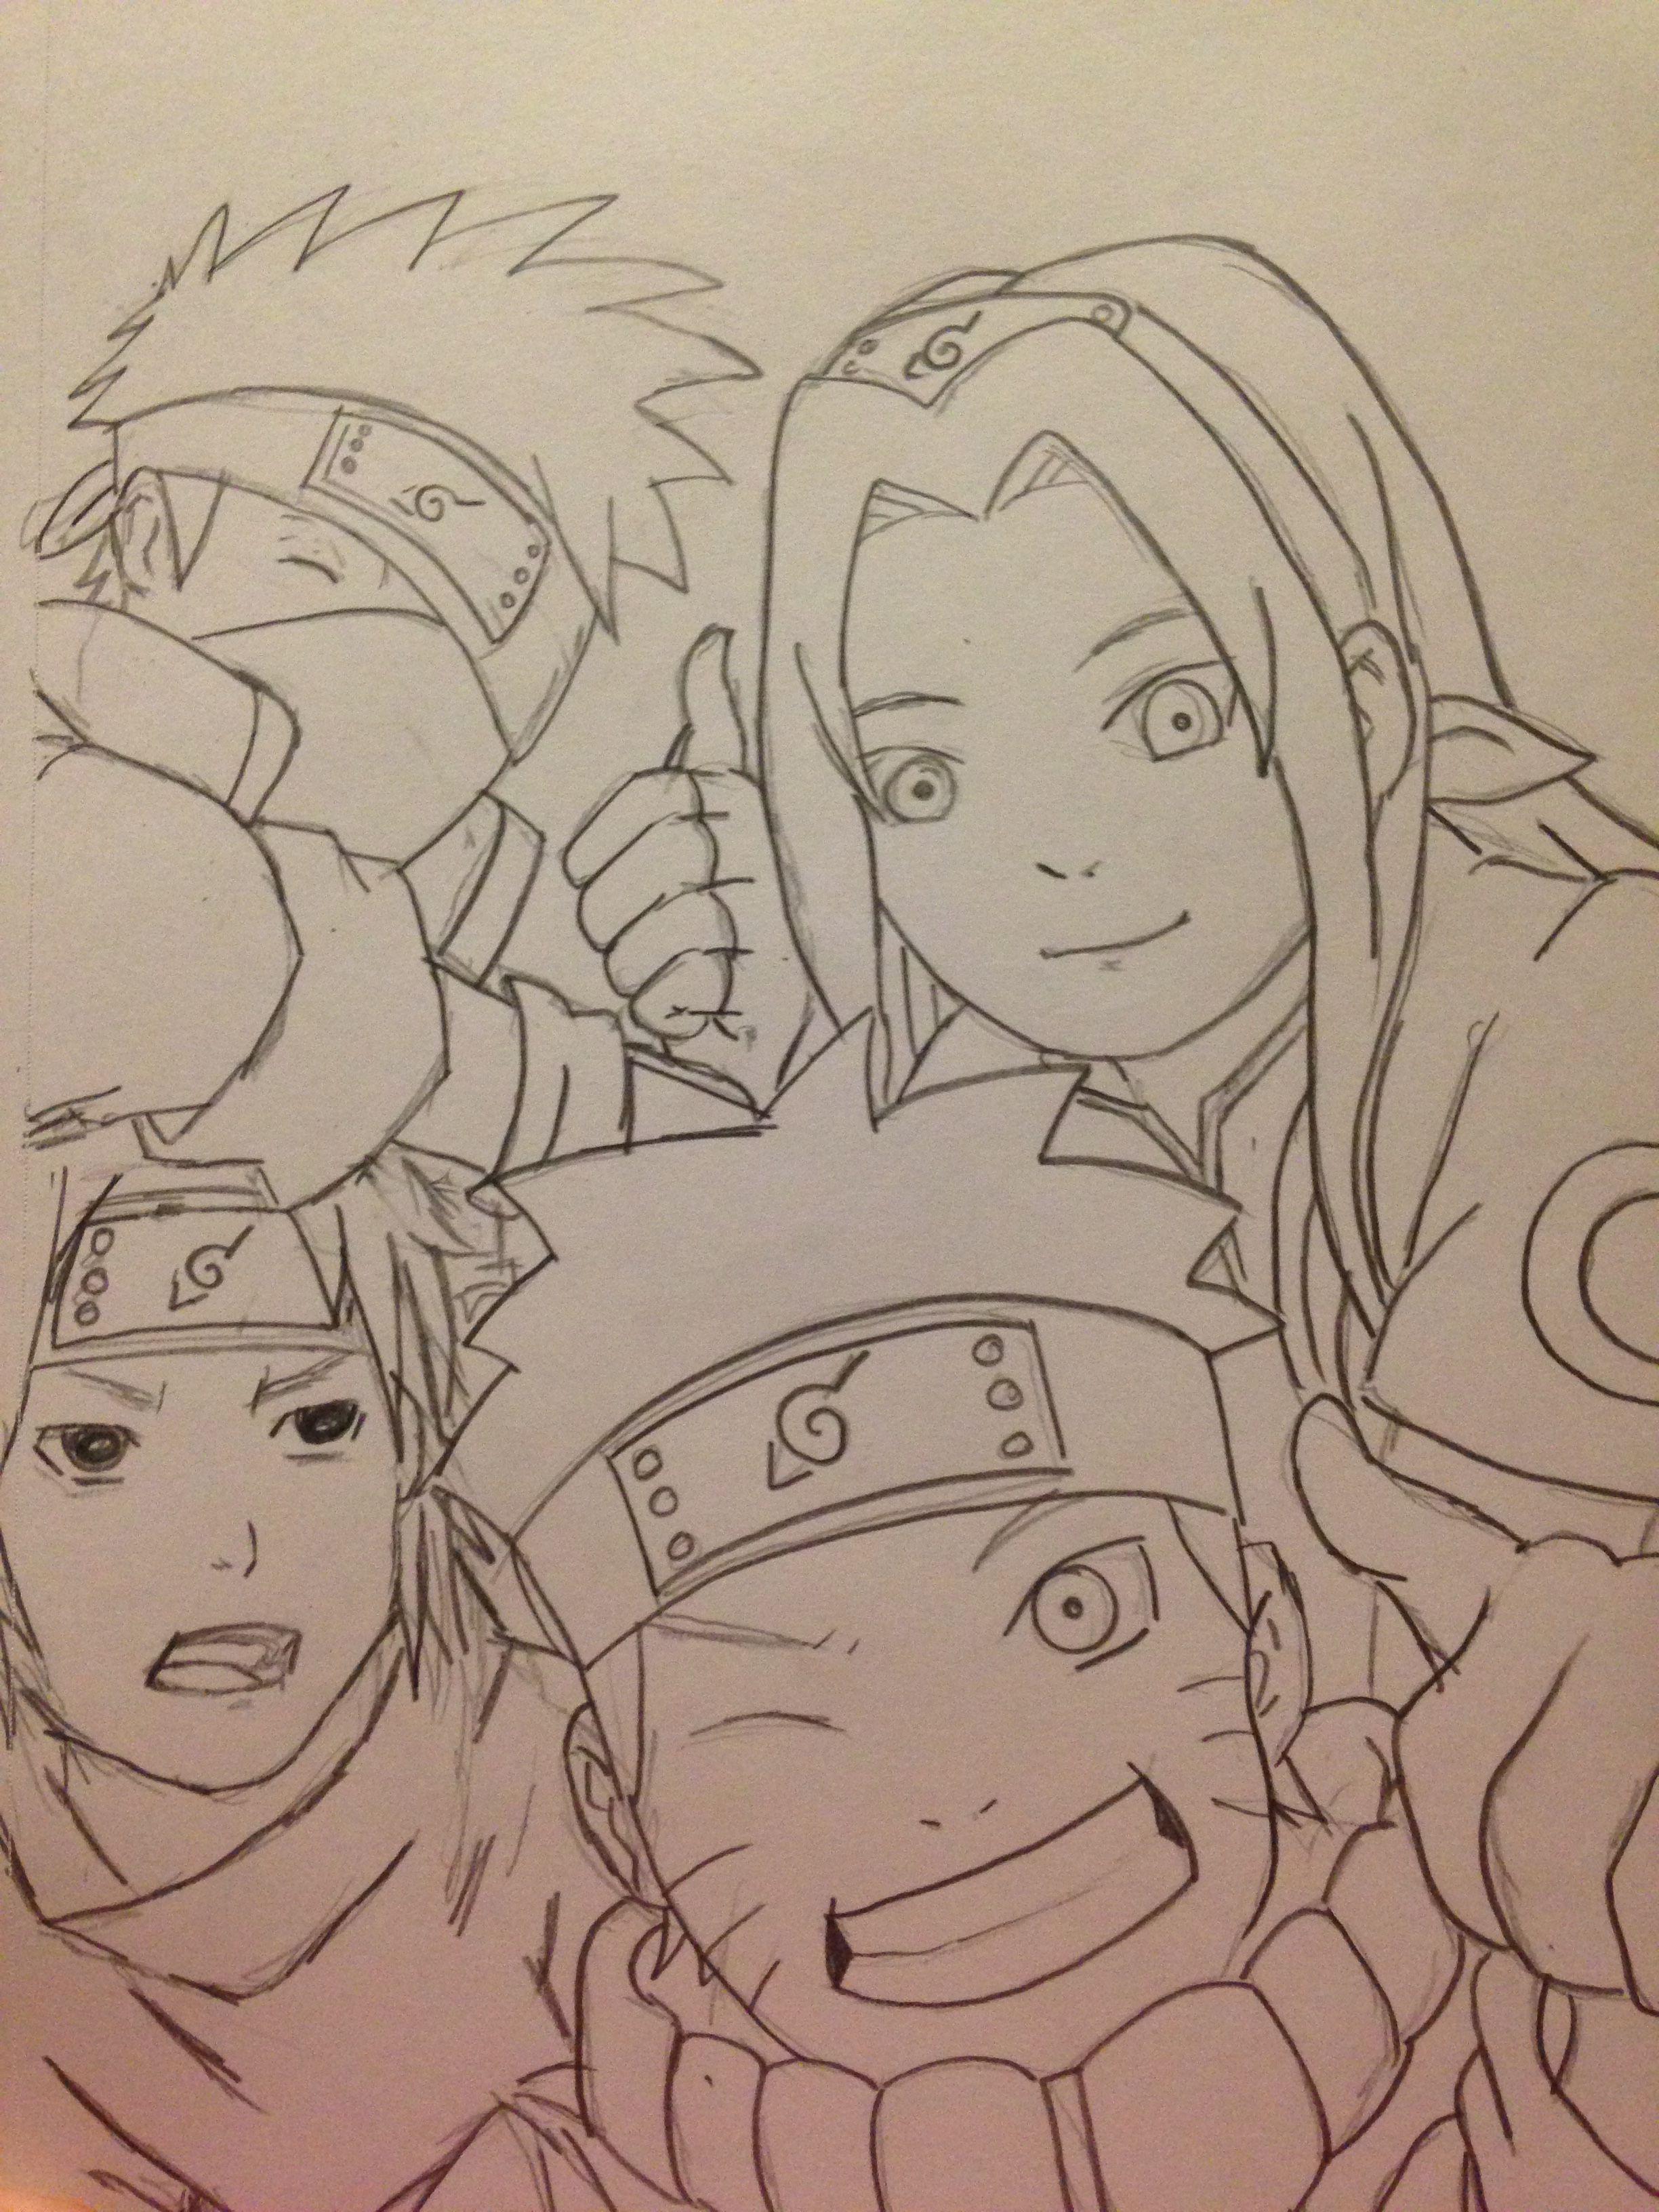 Naruto Team 7 Outline Sketch Naruto Drawings Sketches Drawings